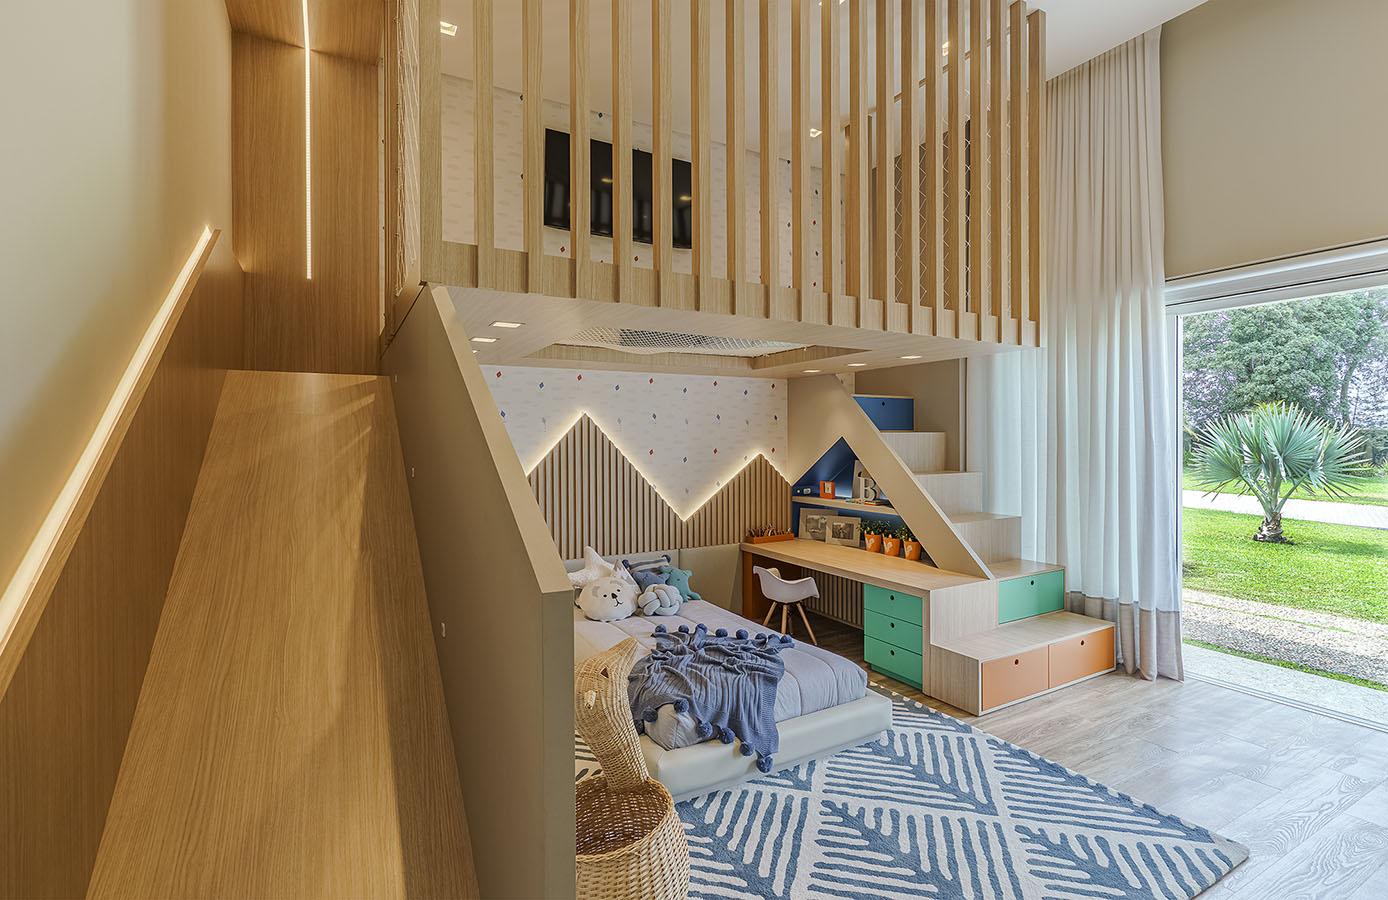 Arquiteto_Curitiba_Arquiteta_AlessandraGandolfi_Residência_LFP_Quarto_Infantil_1